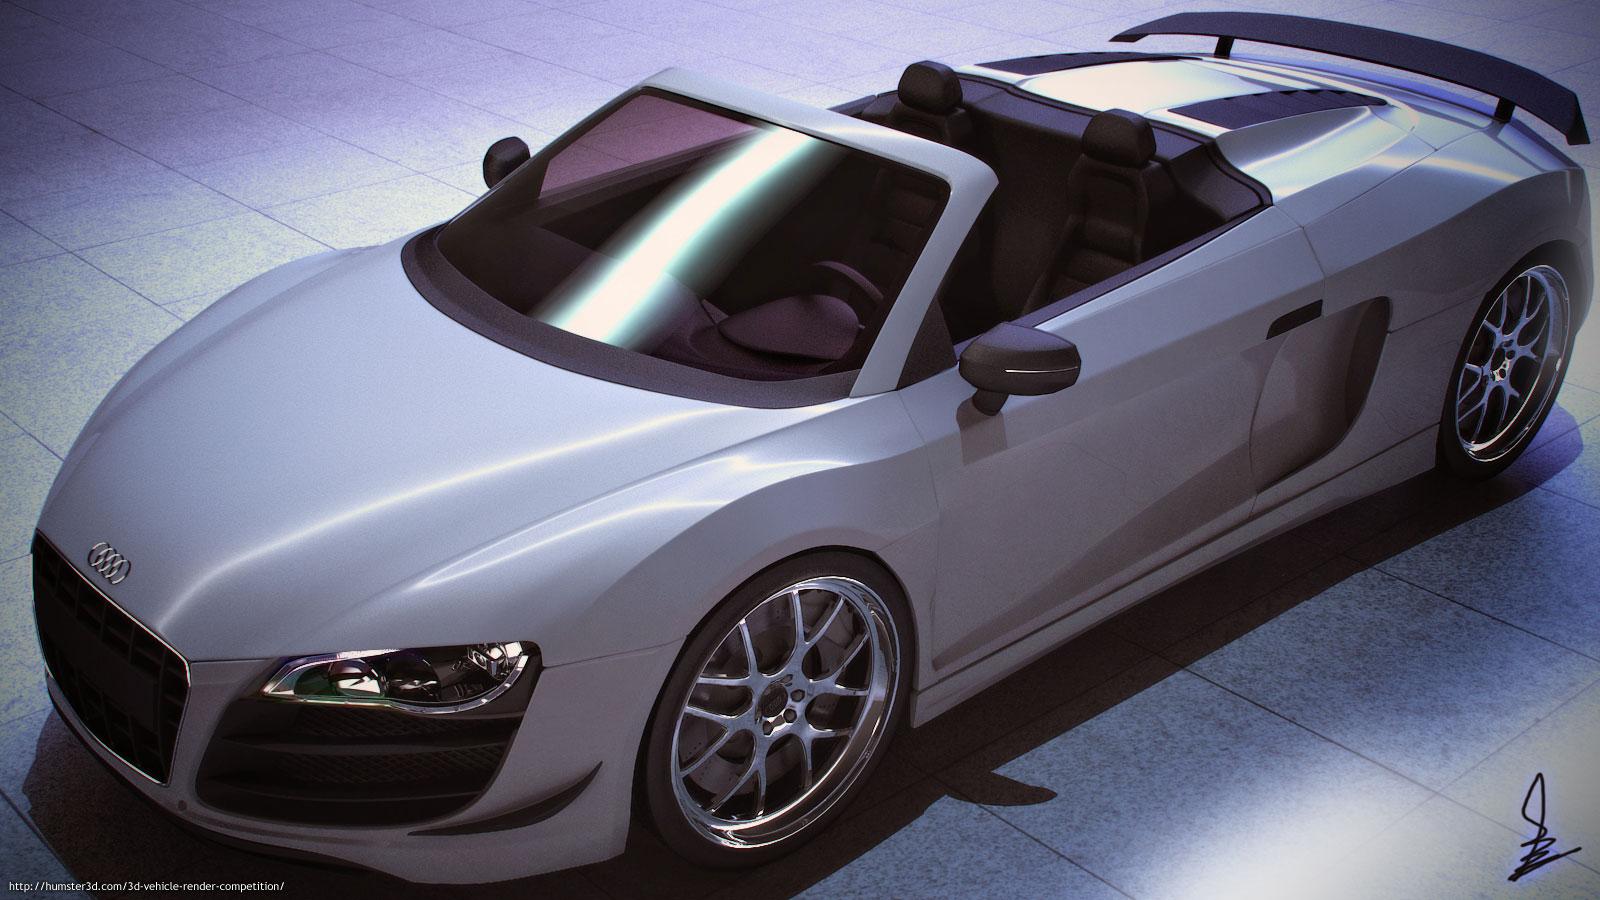 Audi R8 Render 3d art